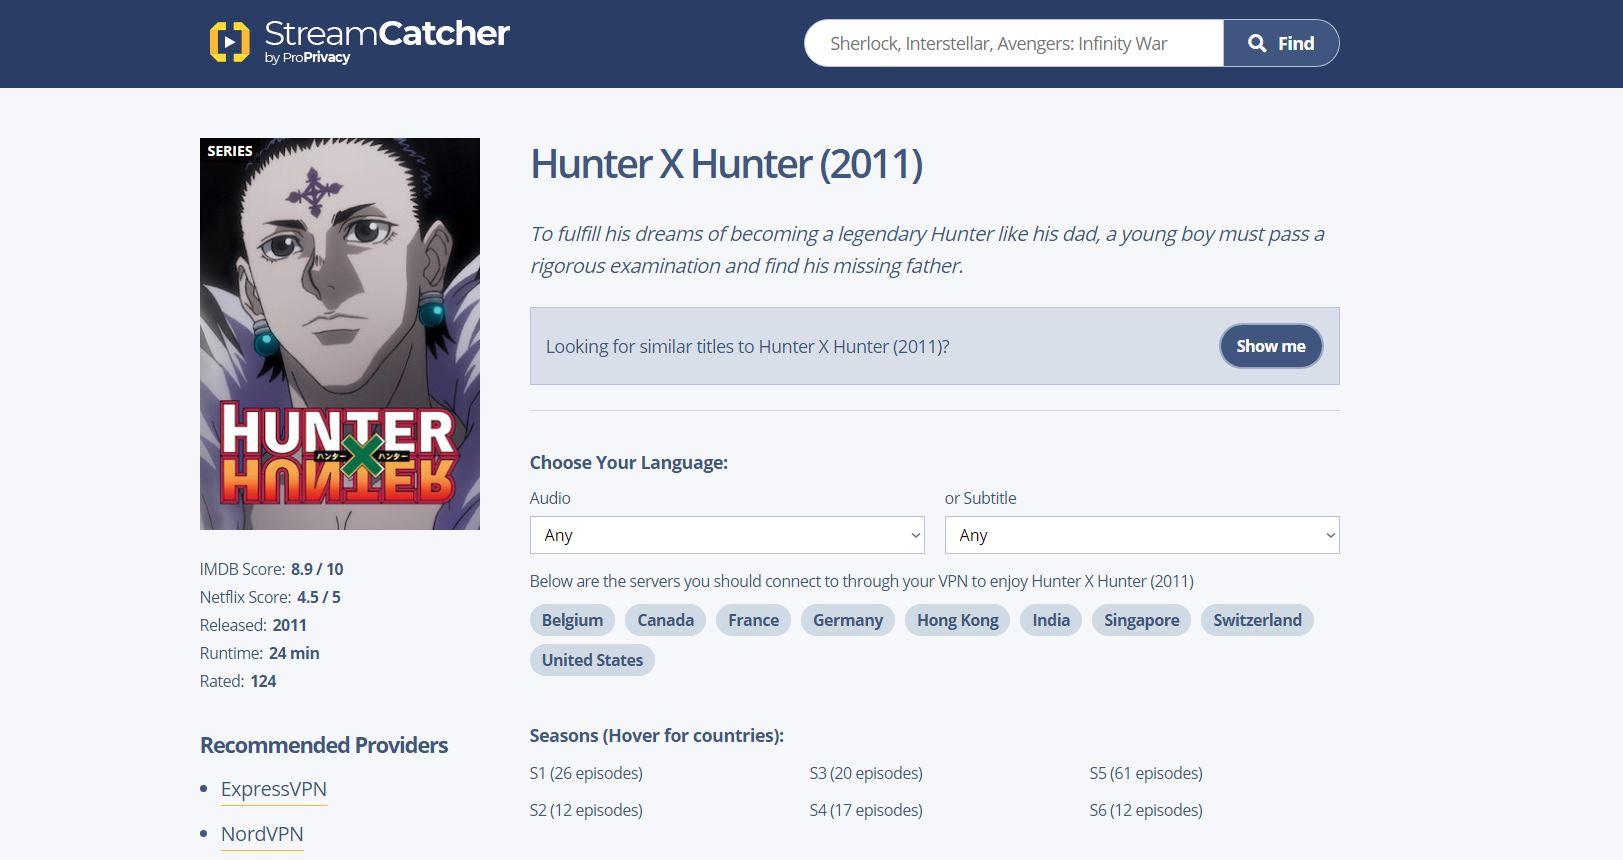 Can You Watch Hunter X Hunter on Netflix?